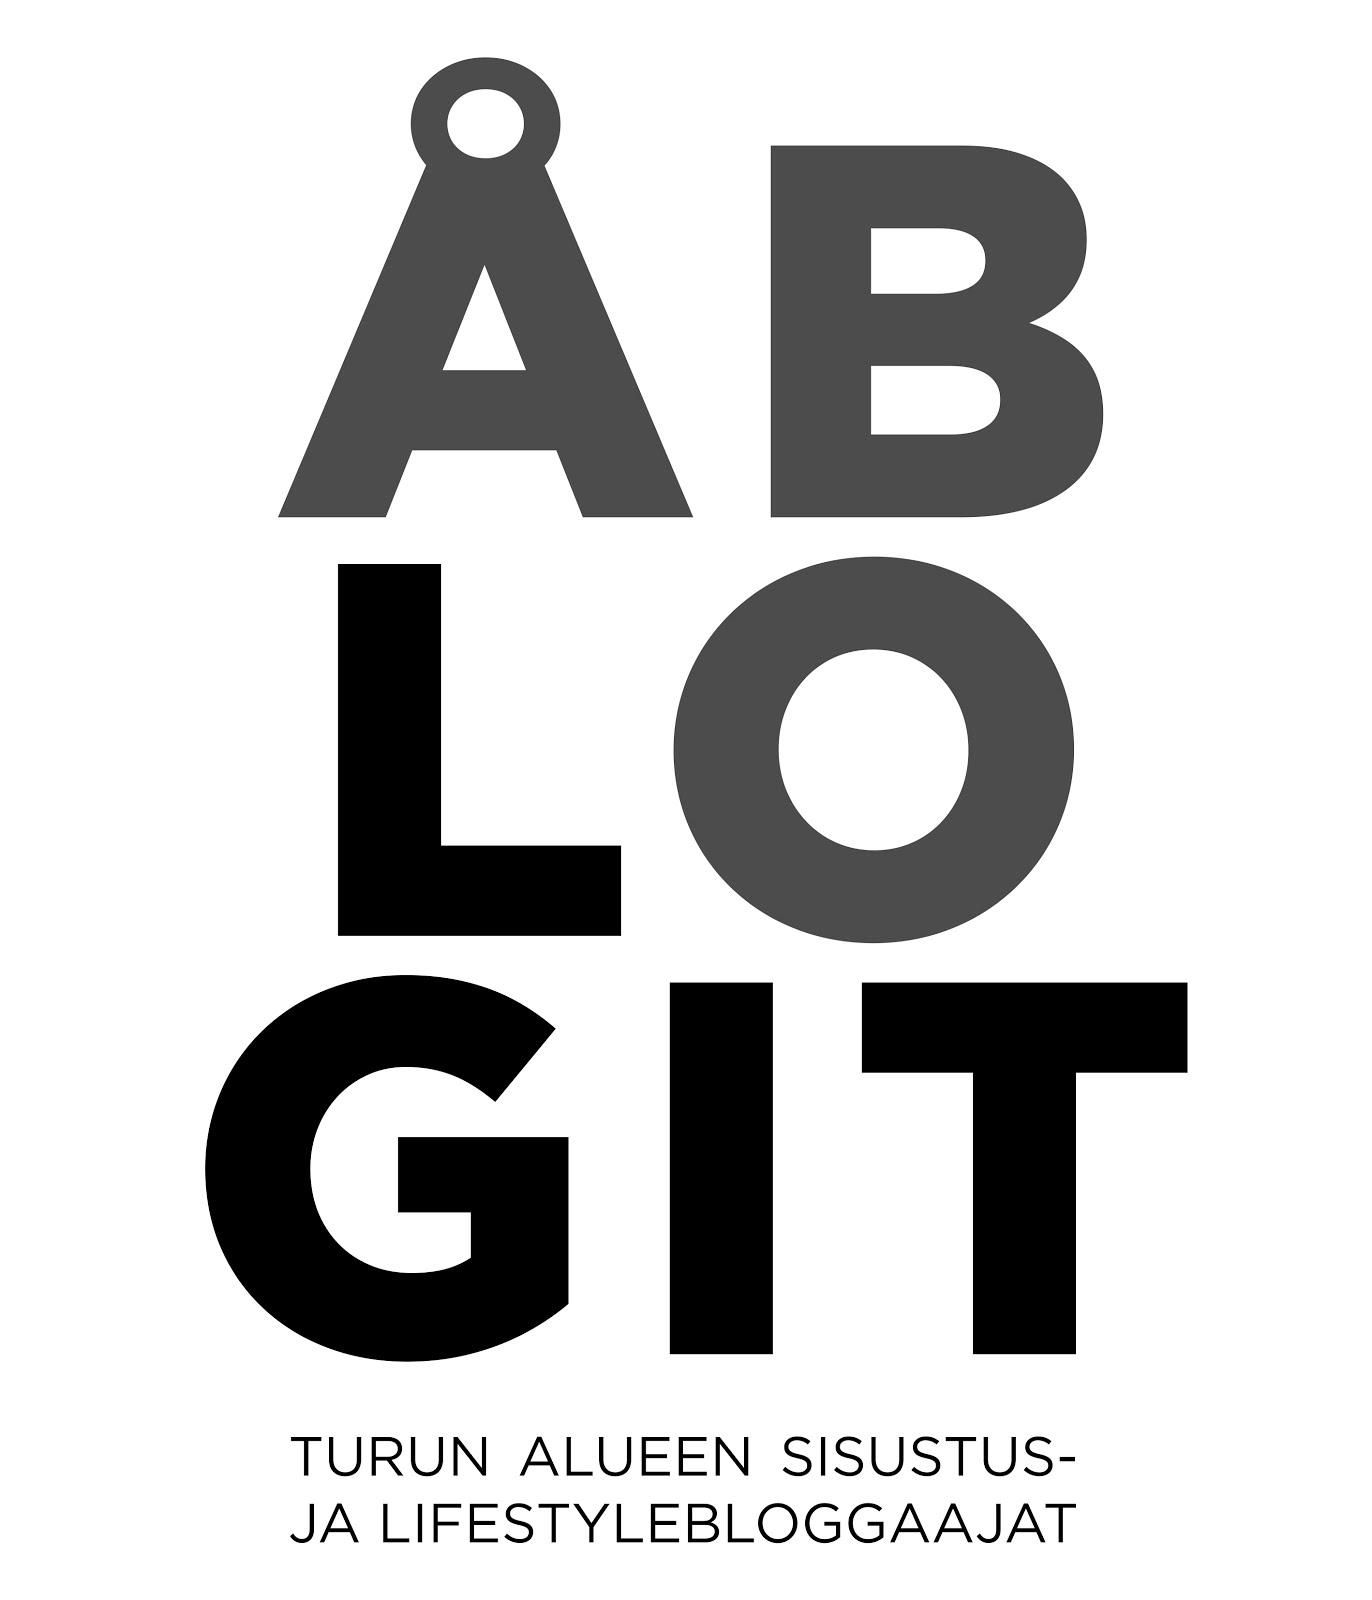 Åblogit-yhteisön jäsen